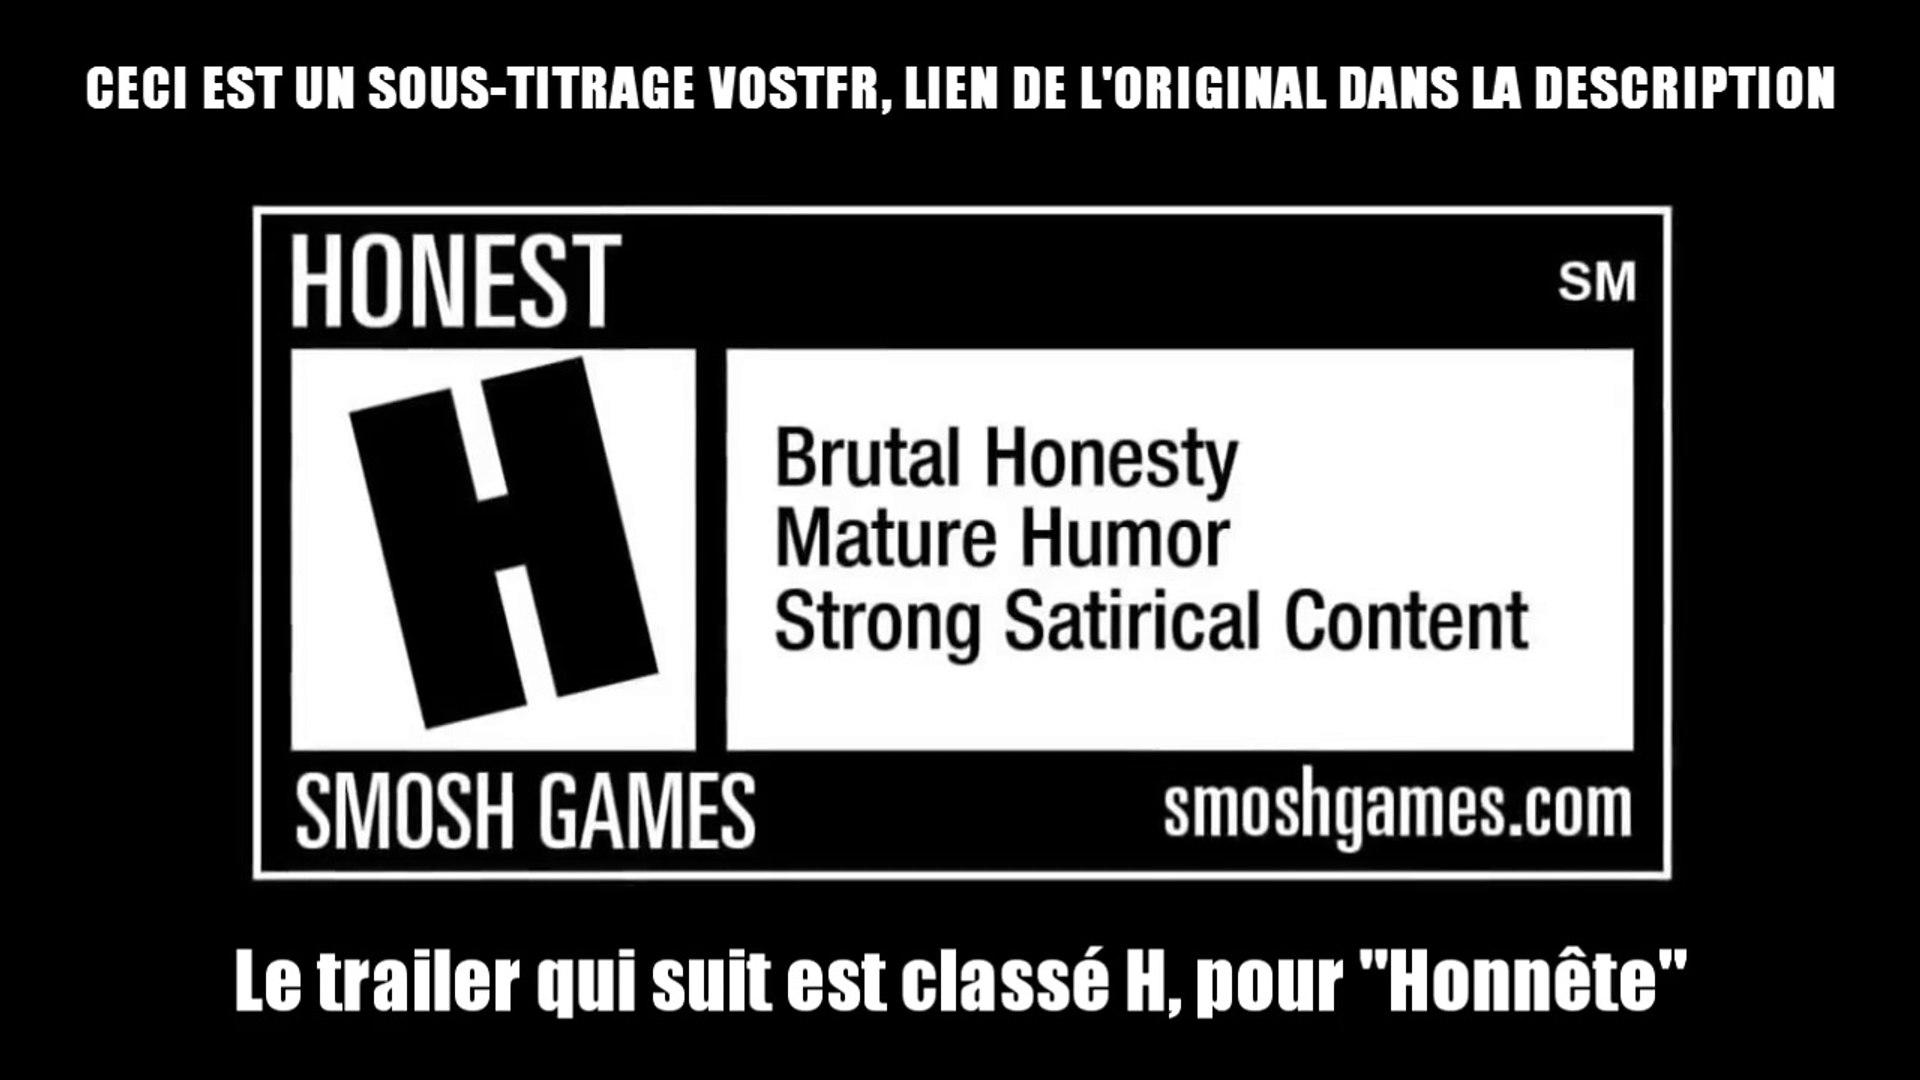 Smosh - Honest Game Trailers - God of War VOSTFR